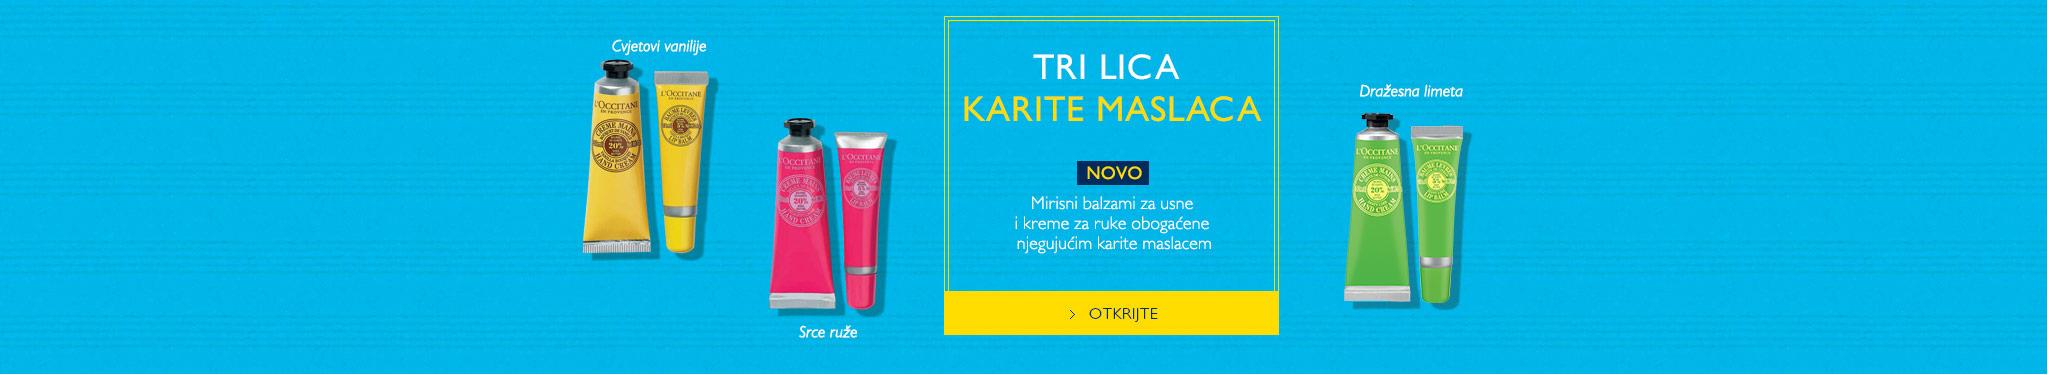 TRI LICA KARITE MASLACA